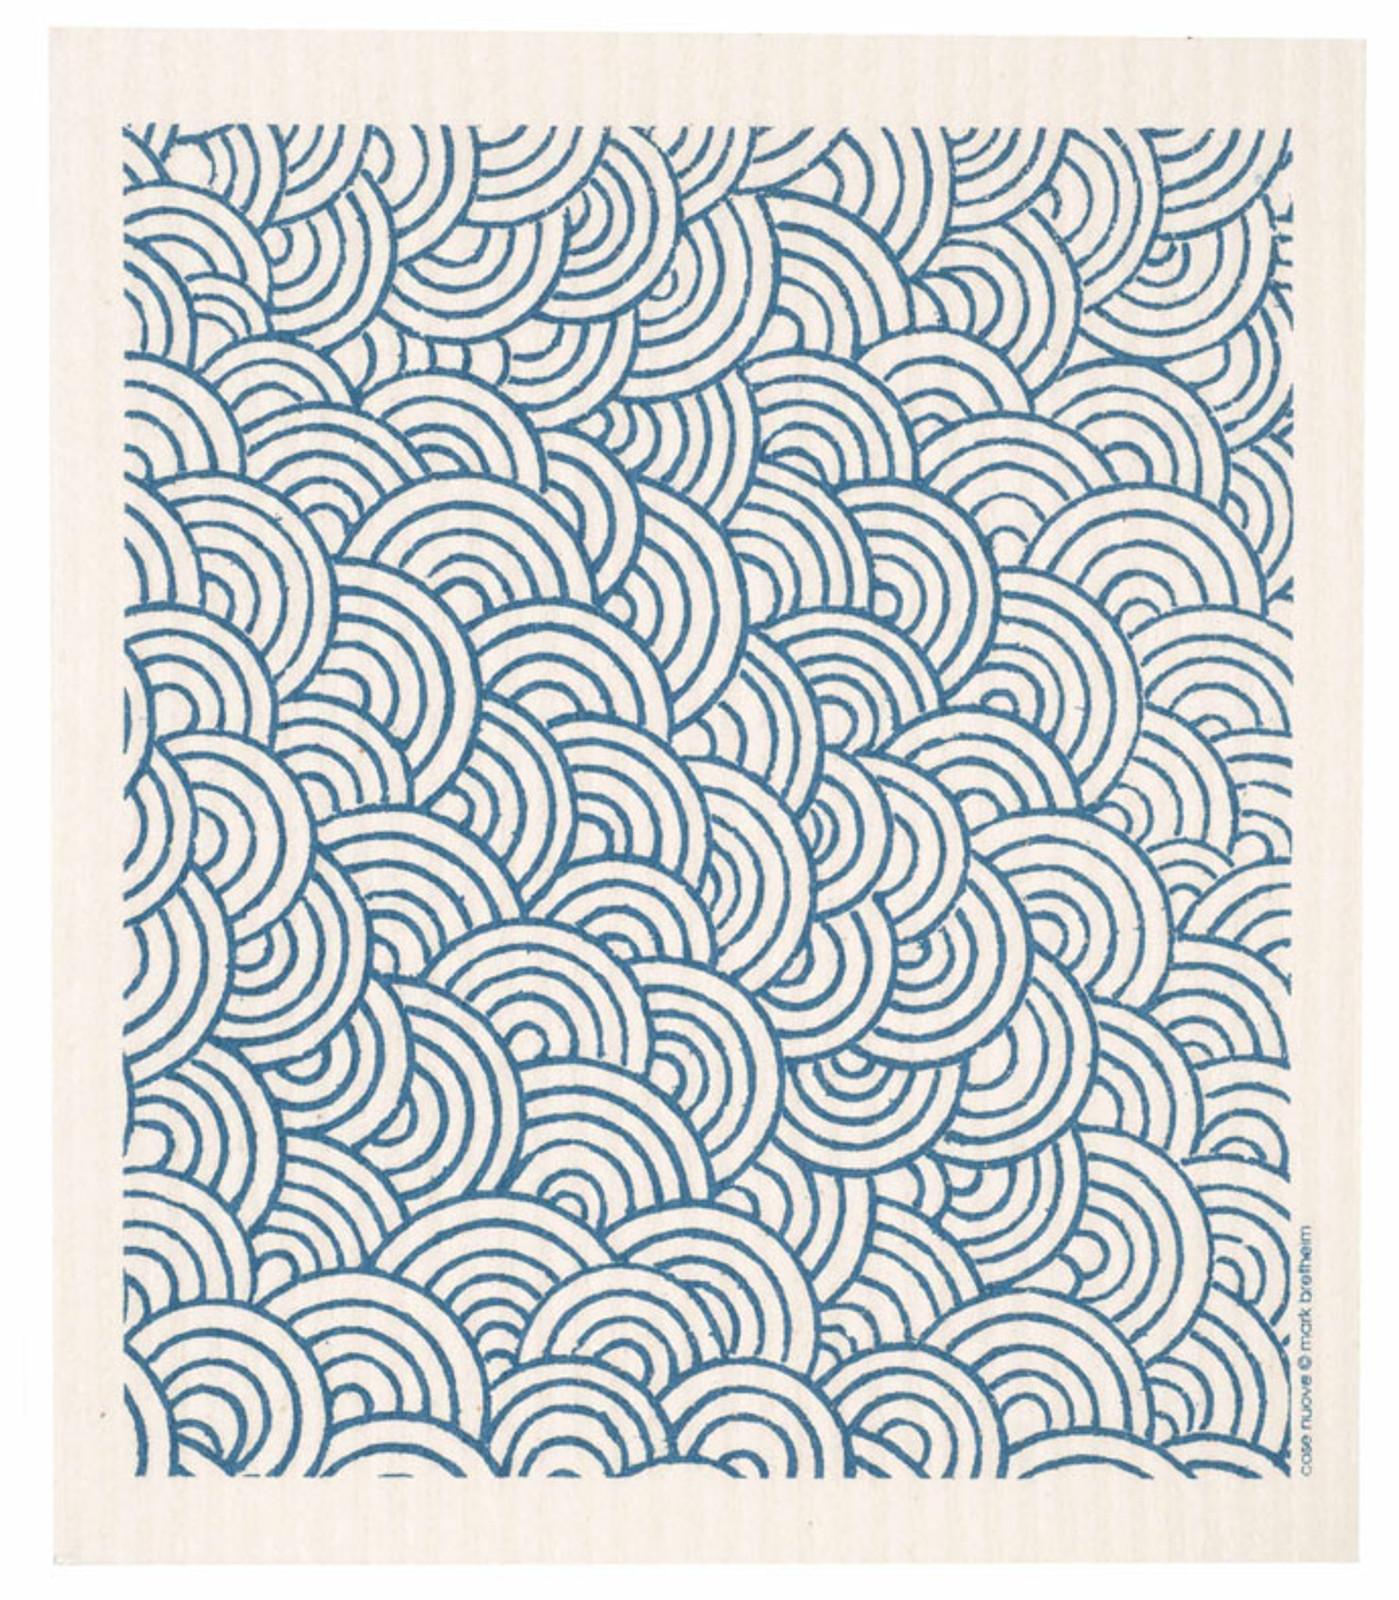 Swedish dish cloth, Blue Circles design